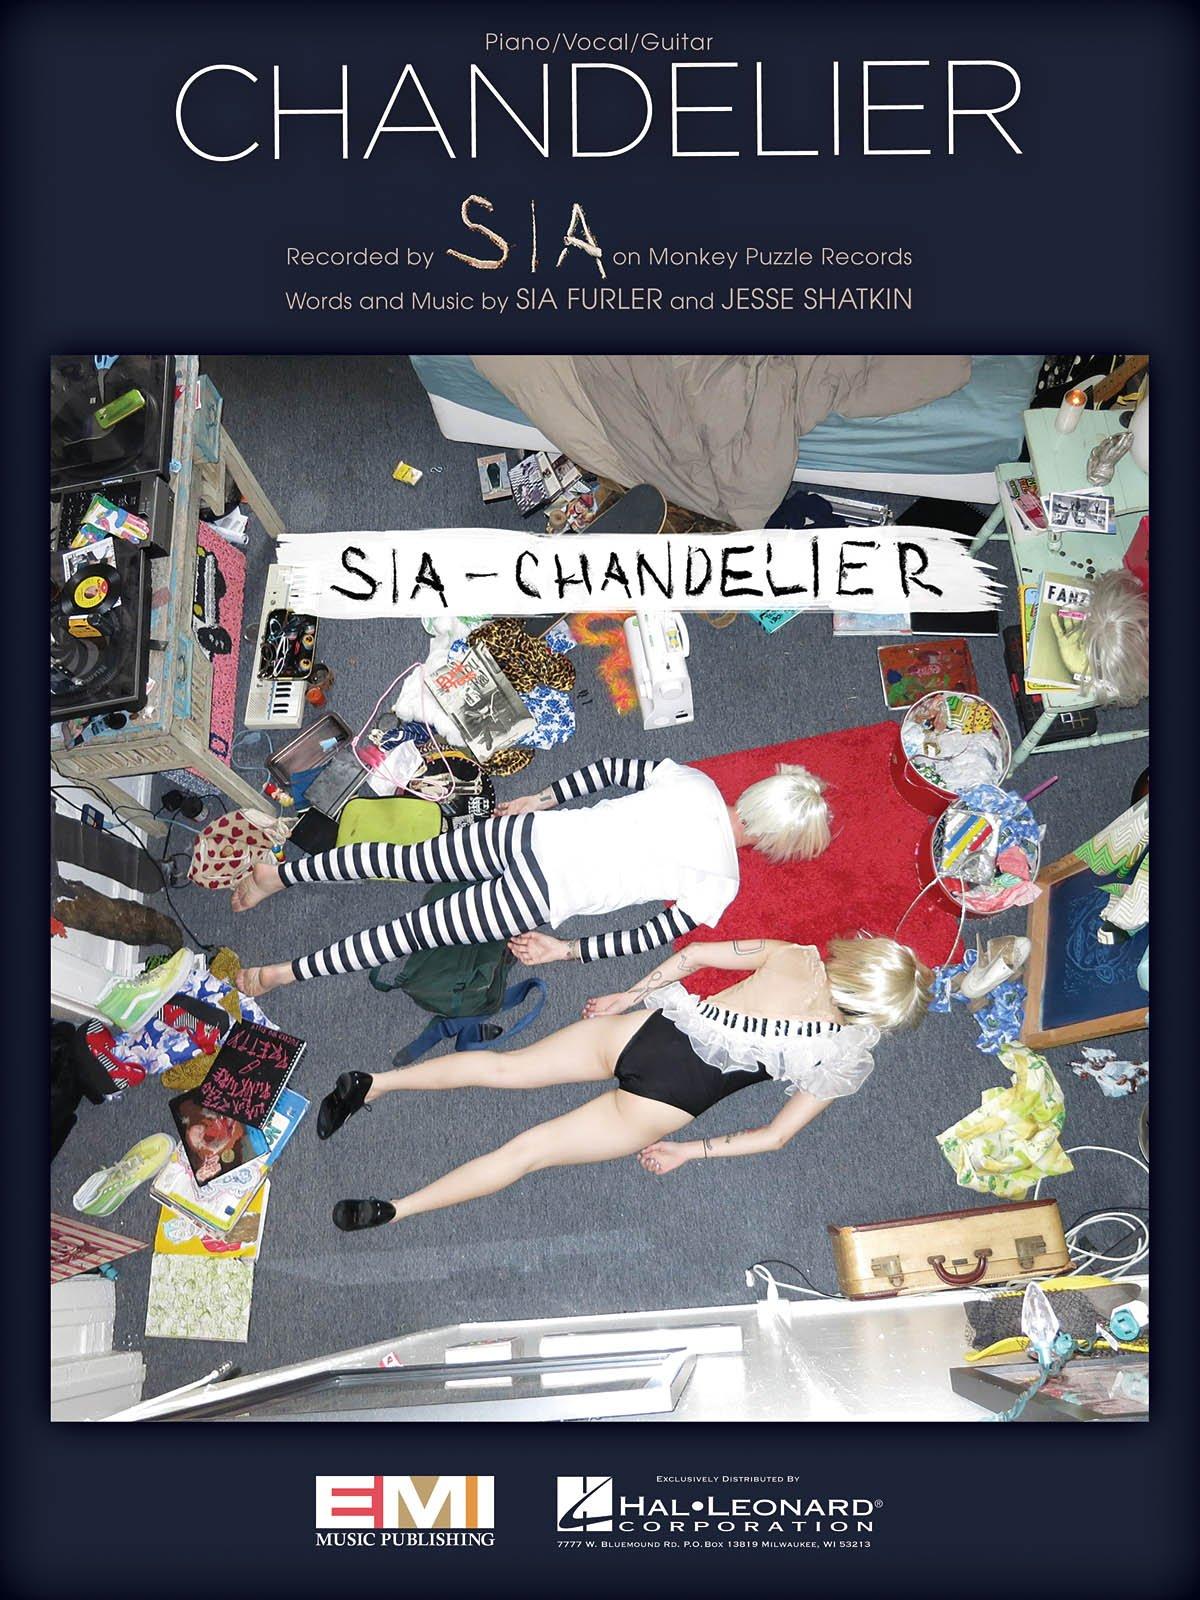 SIA - Chandelier - Sheet Music Single: 0888680029746: Amazon.com ...